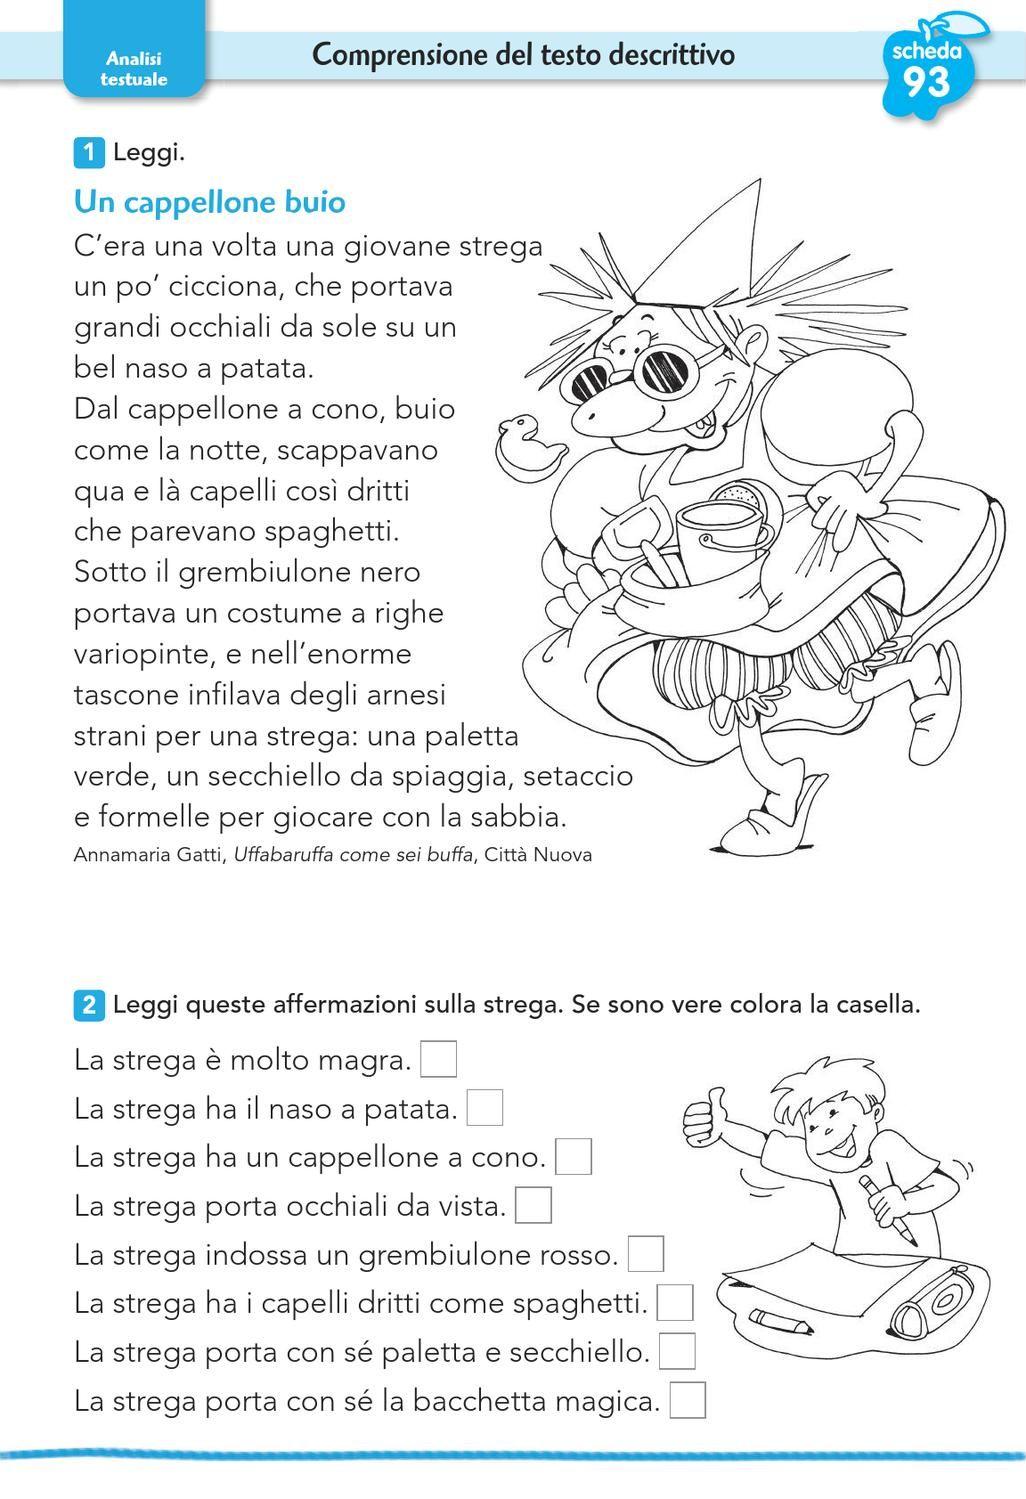 006af Boscasso L Tesio G Una Parola Tira L Altra 1